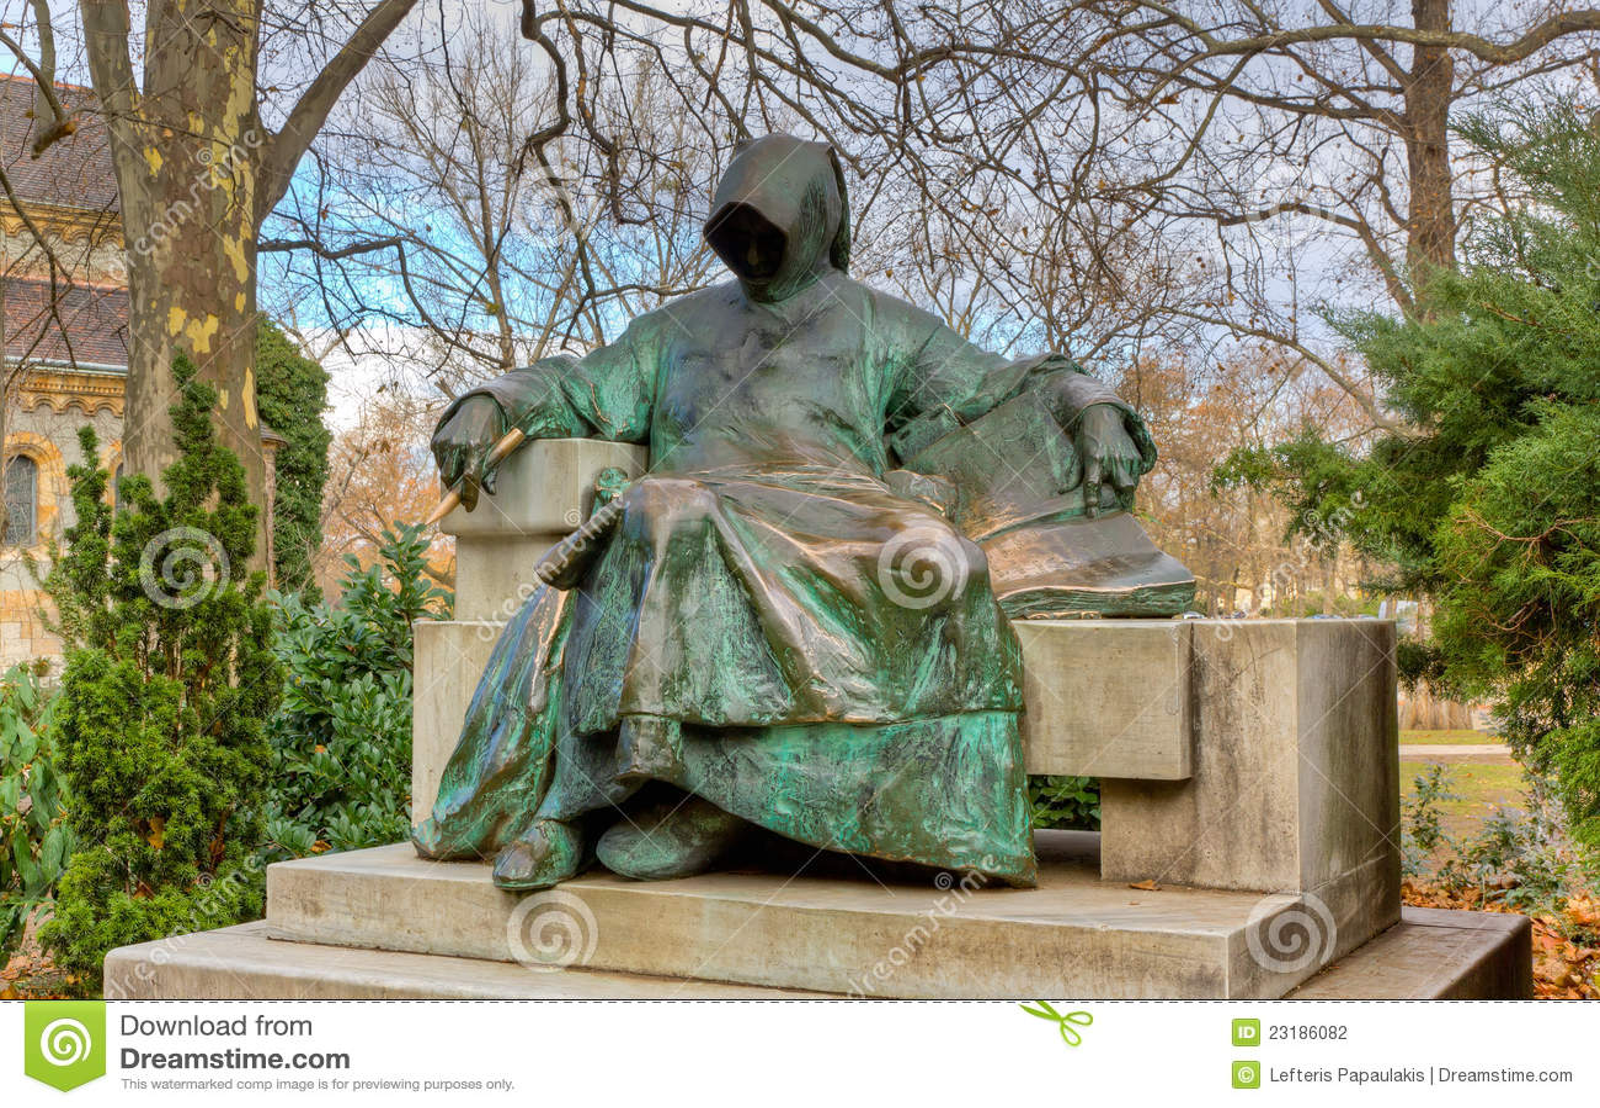 Anonimowy Budapest grodowy statuy vajdahunyad